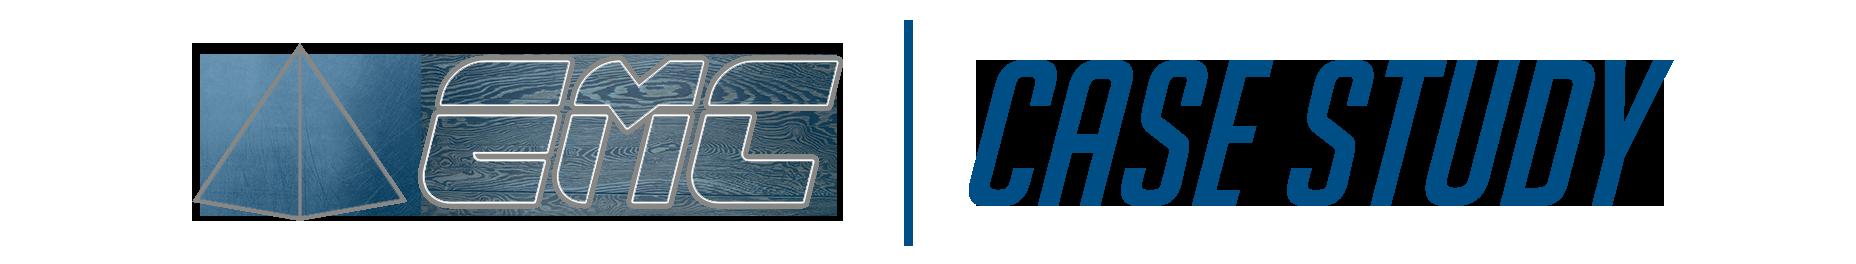 SC-Case-Study-Logo-EMC